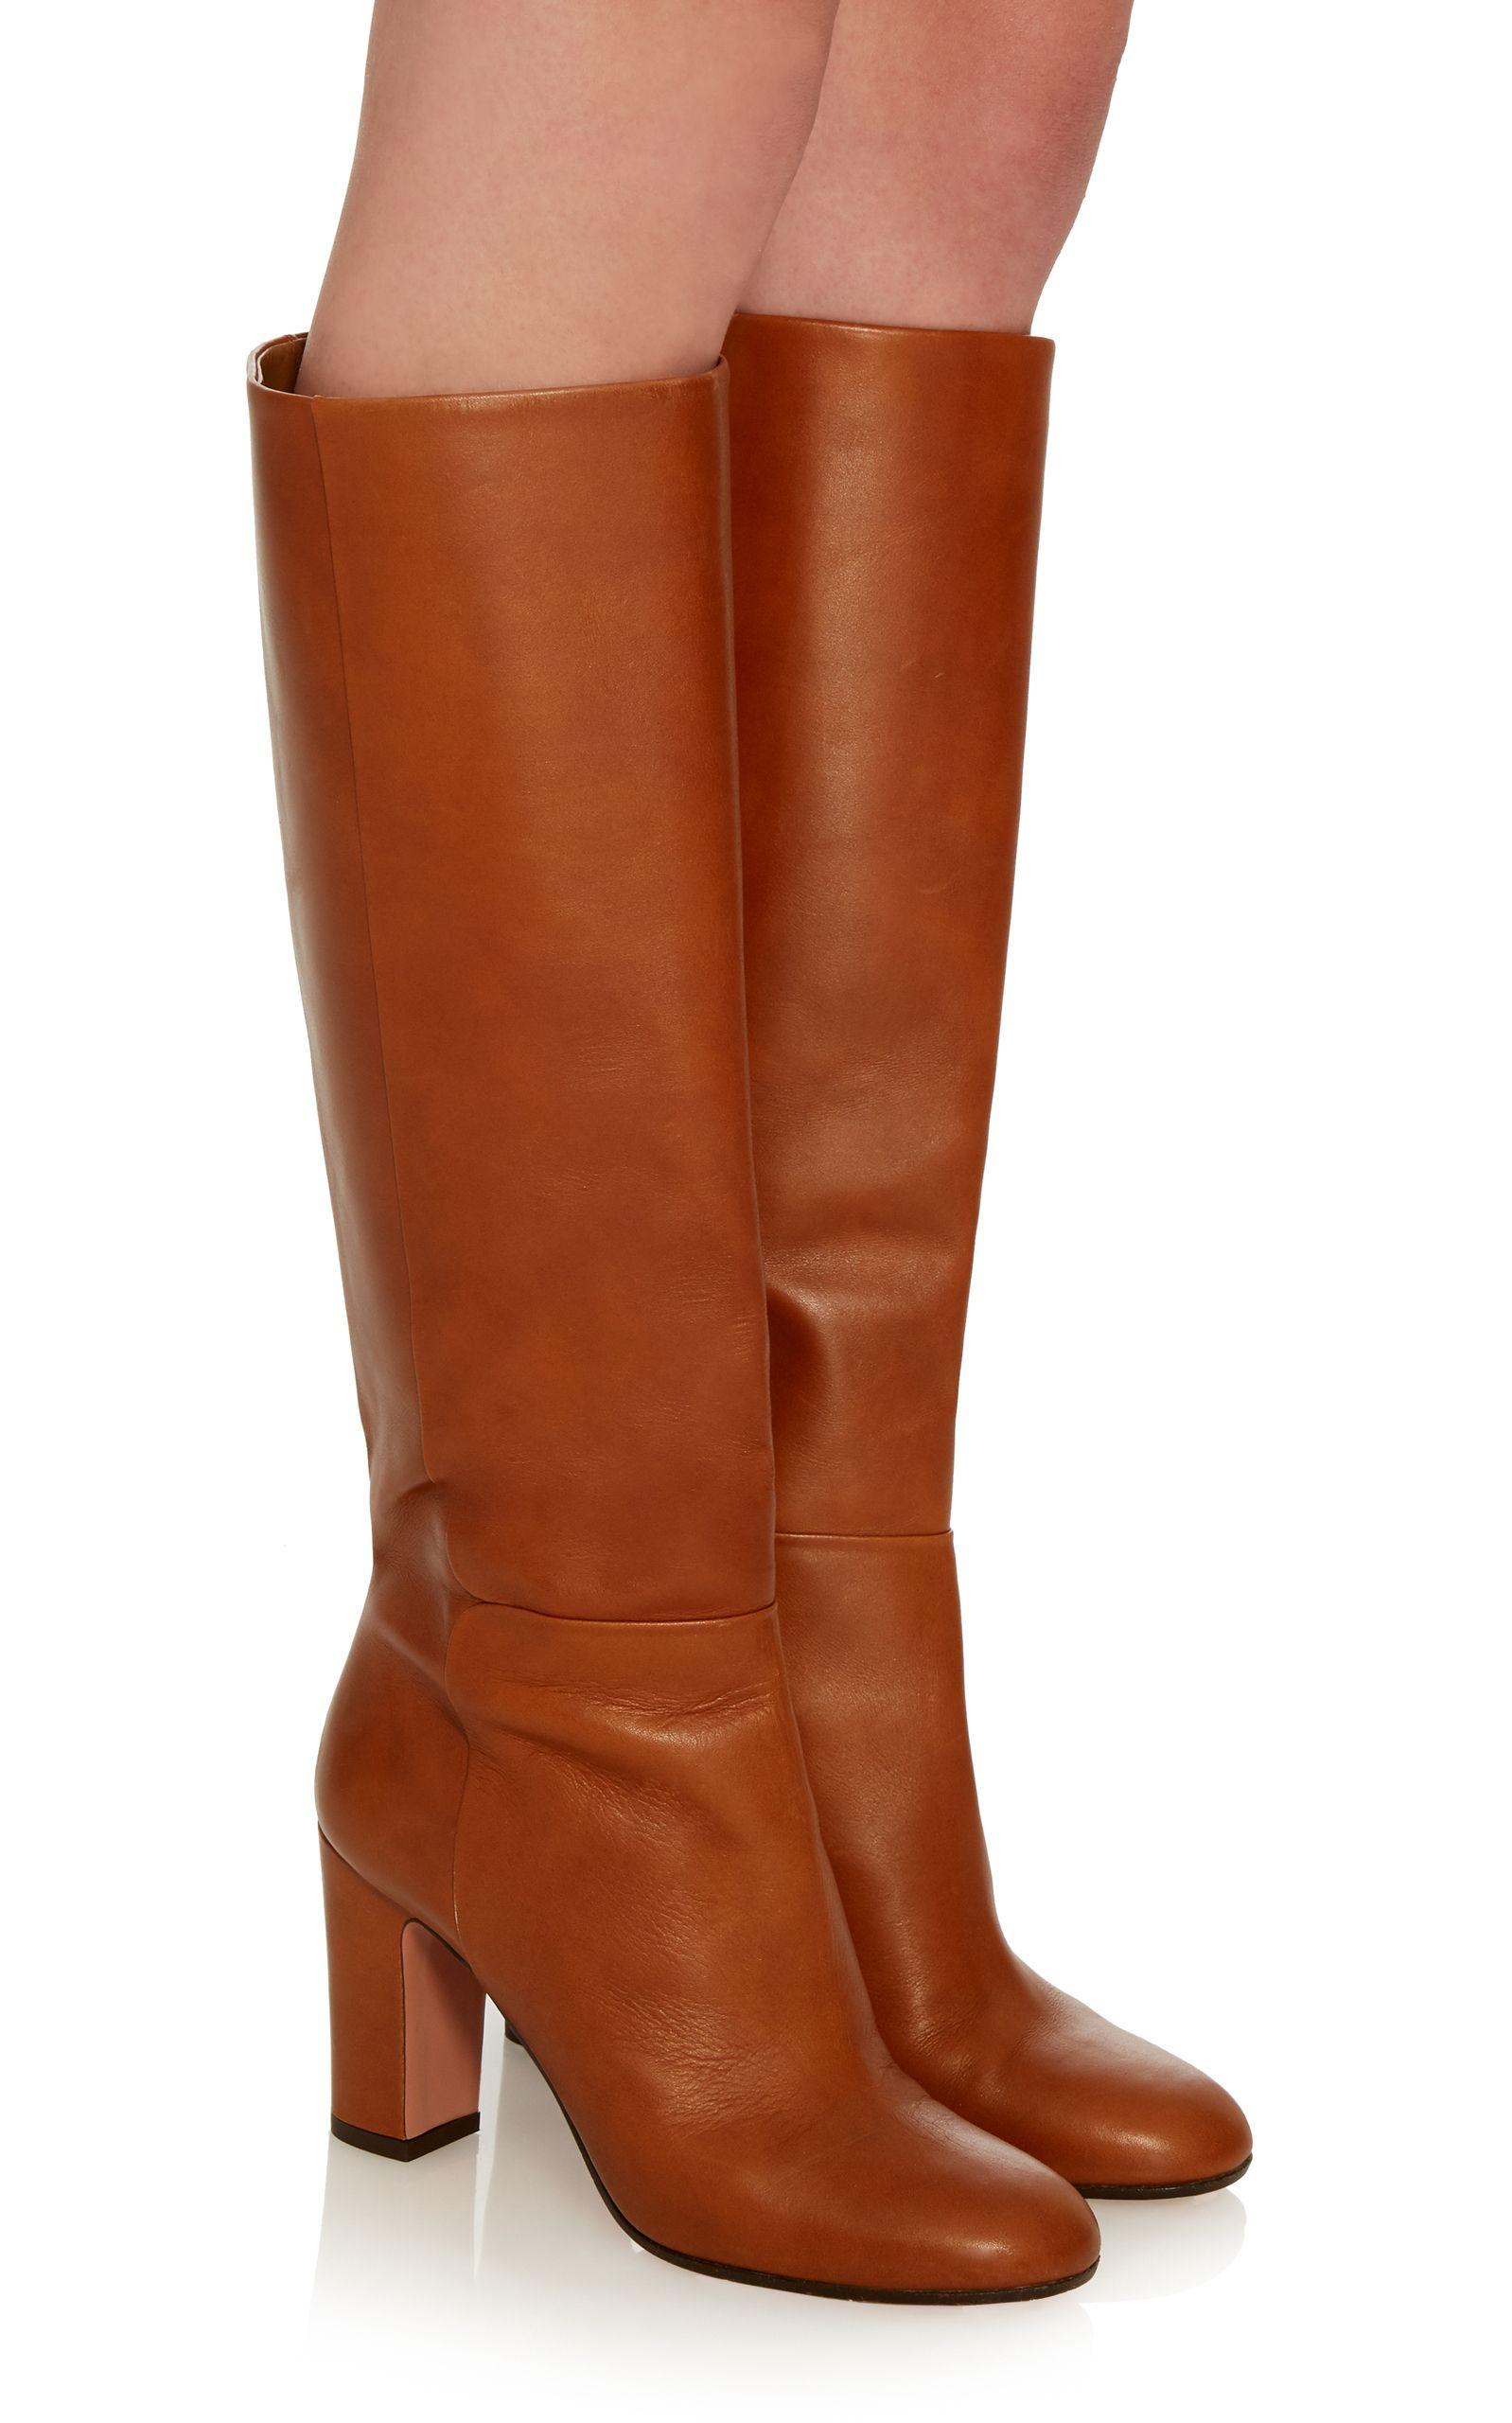 Aquazzura Brera Leather Boots Ysnrn